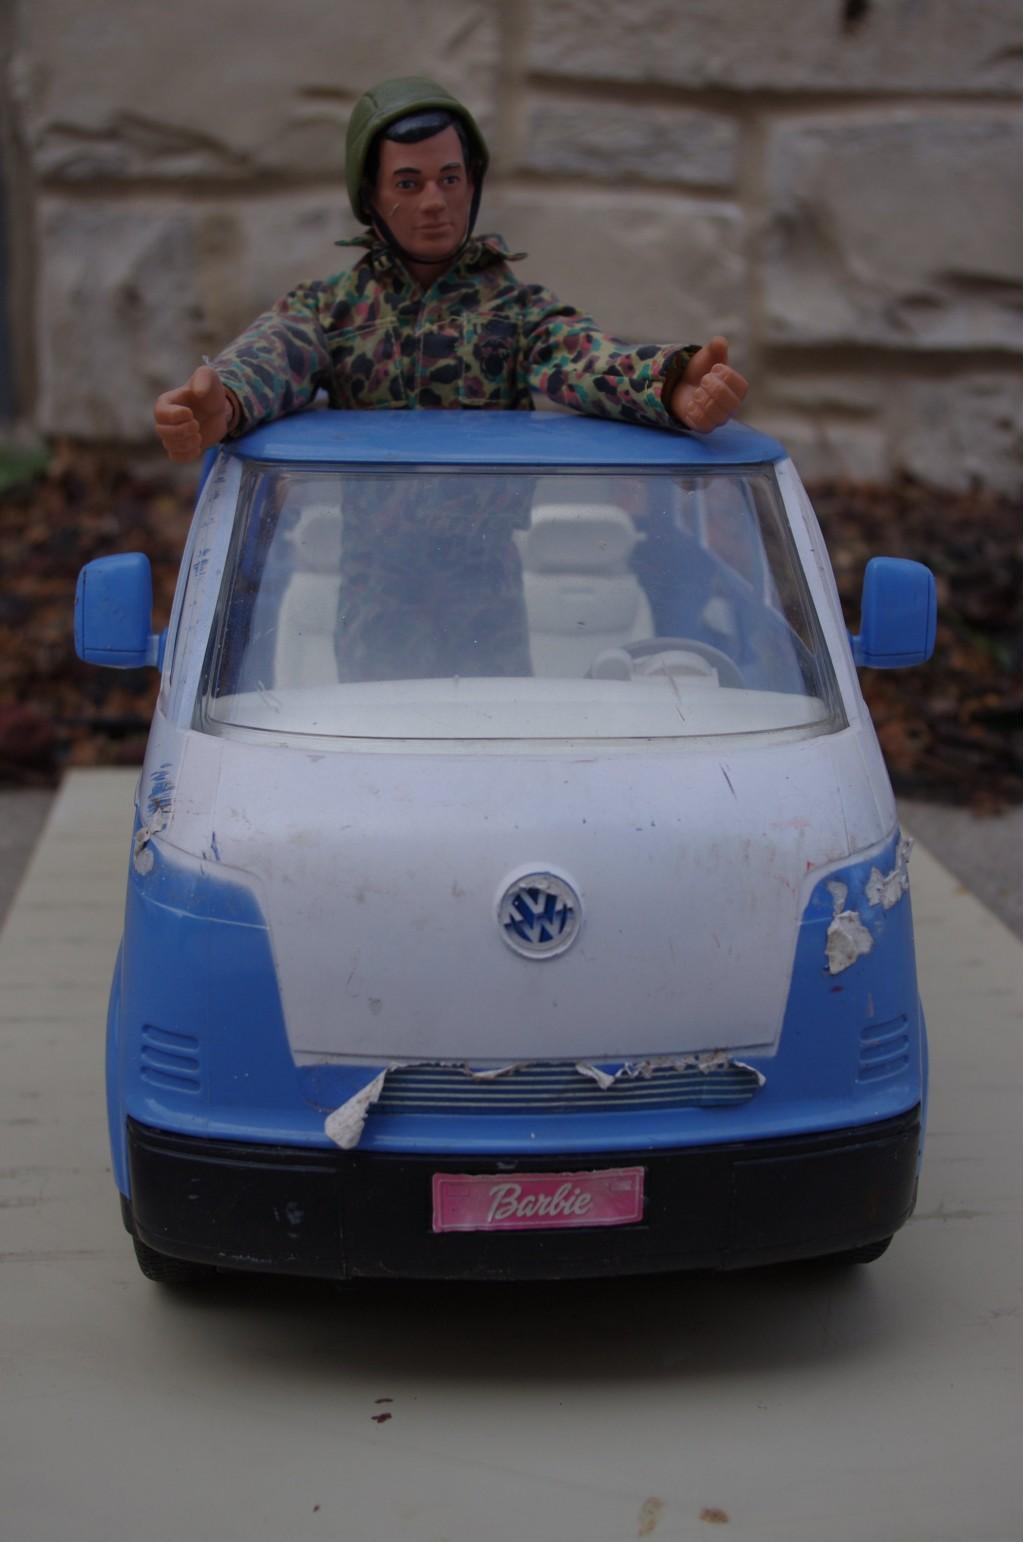 Barbie's Bus, GI Joe Not Included